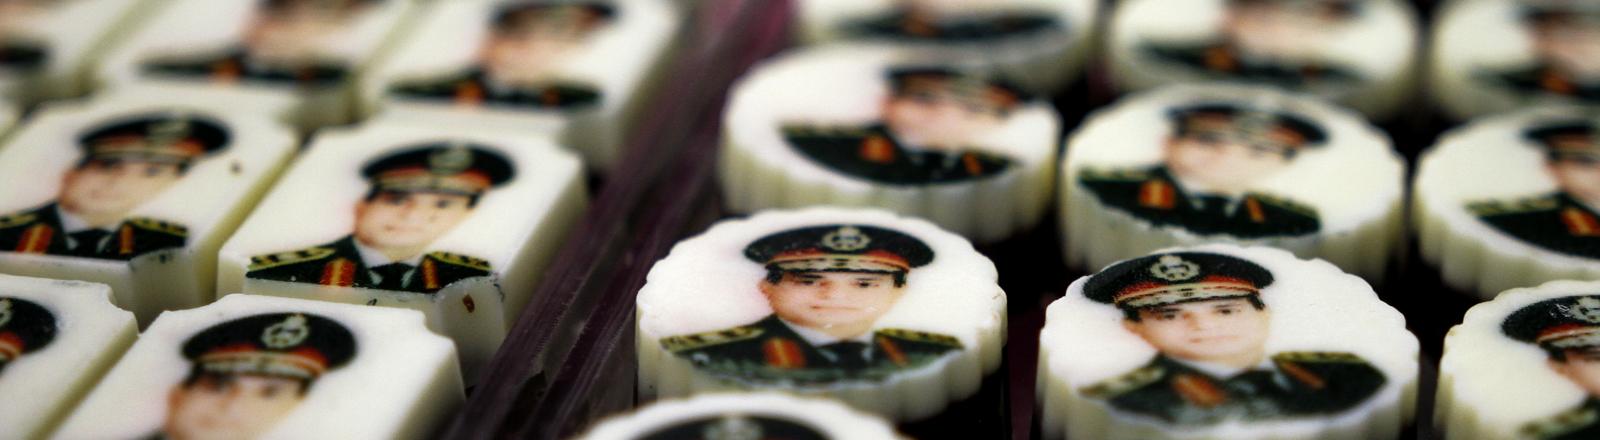 Ägyptens Militärchef Abd al-Fattah as-Sisi auf Pralinen.